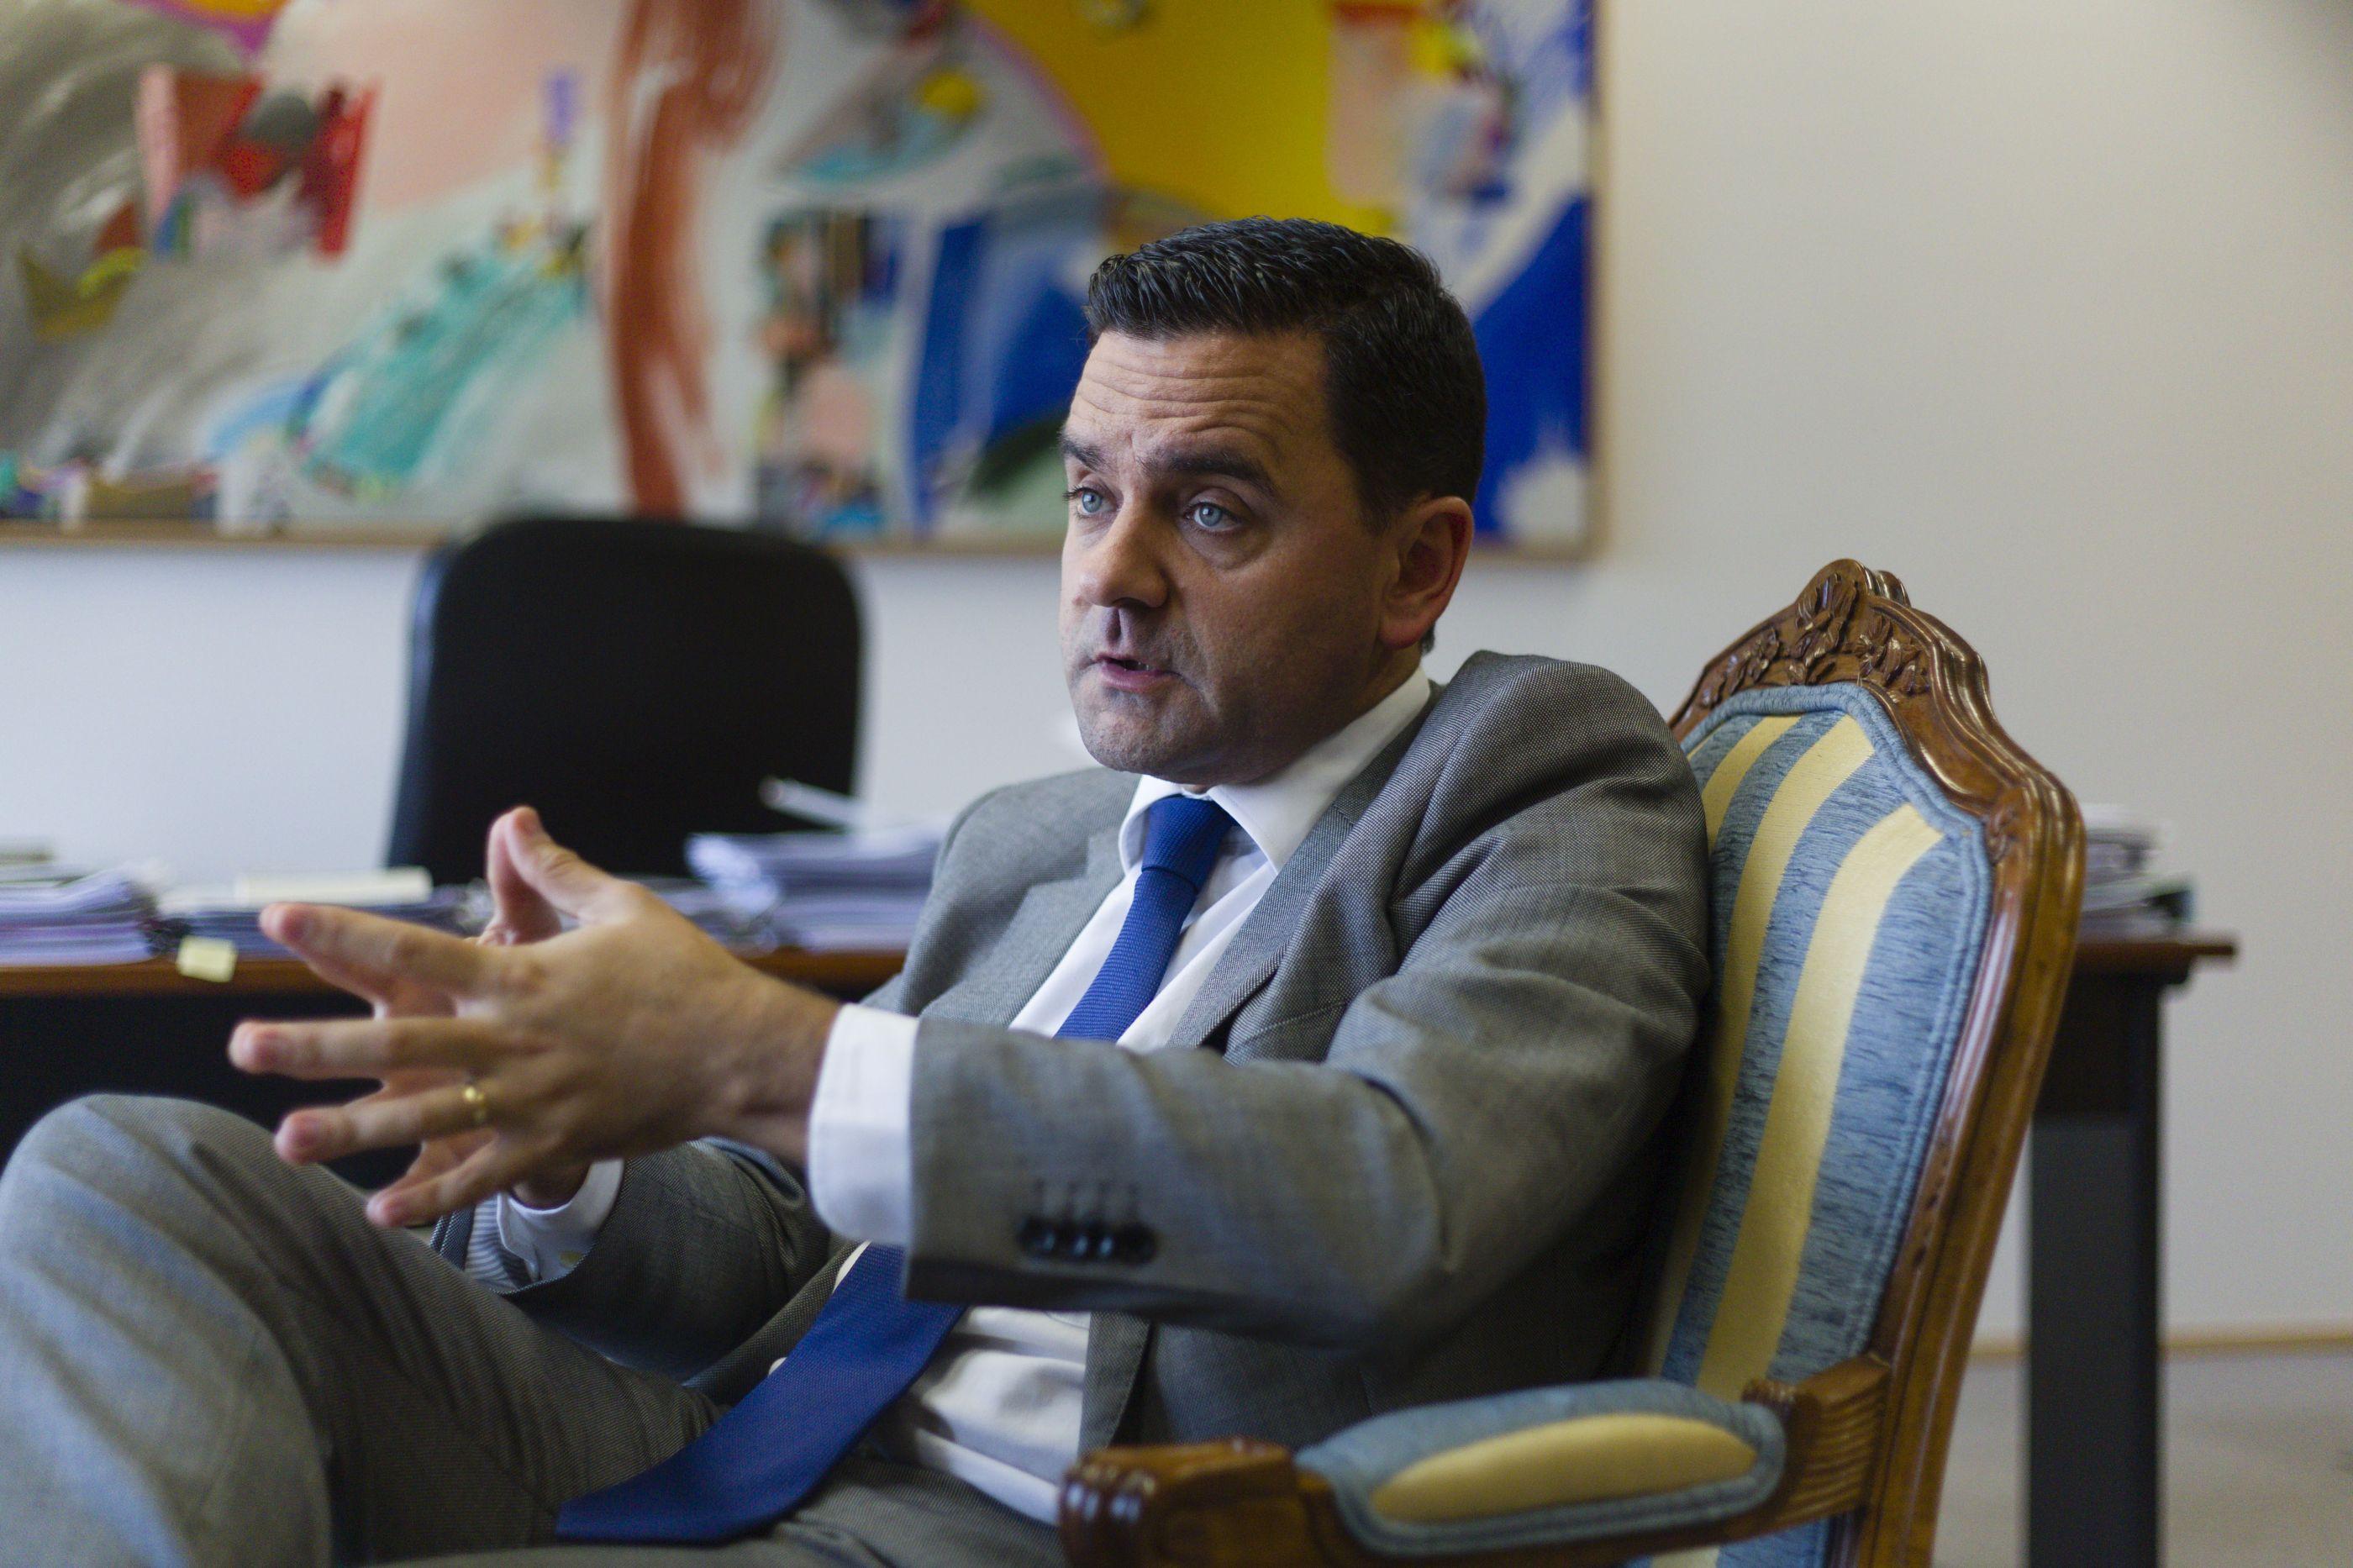 Parlamento chama ministro Pedro Marques à comissão de inquérito à TAP